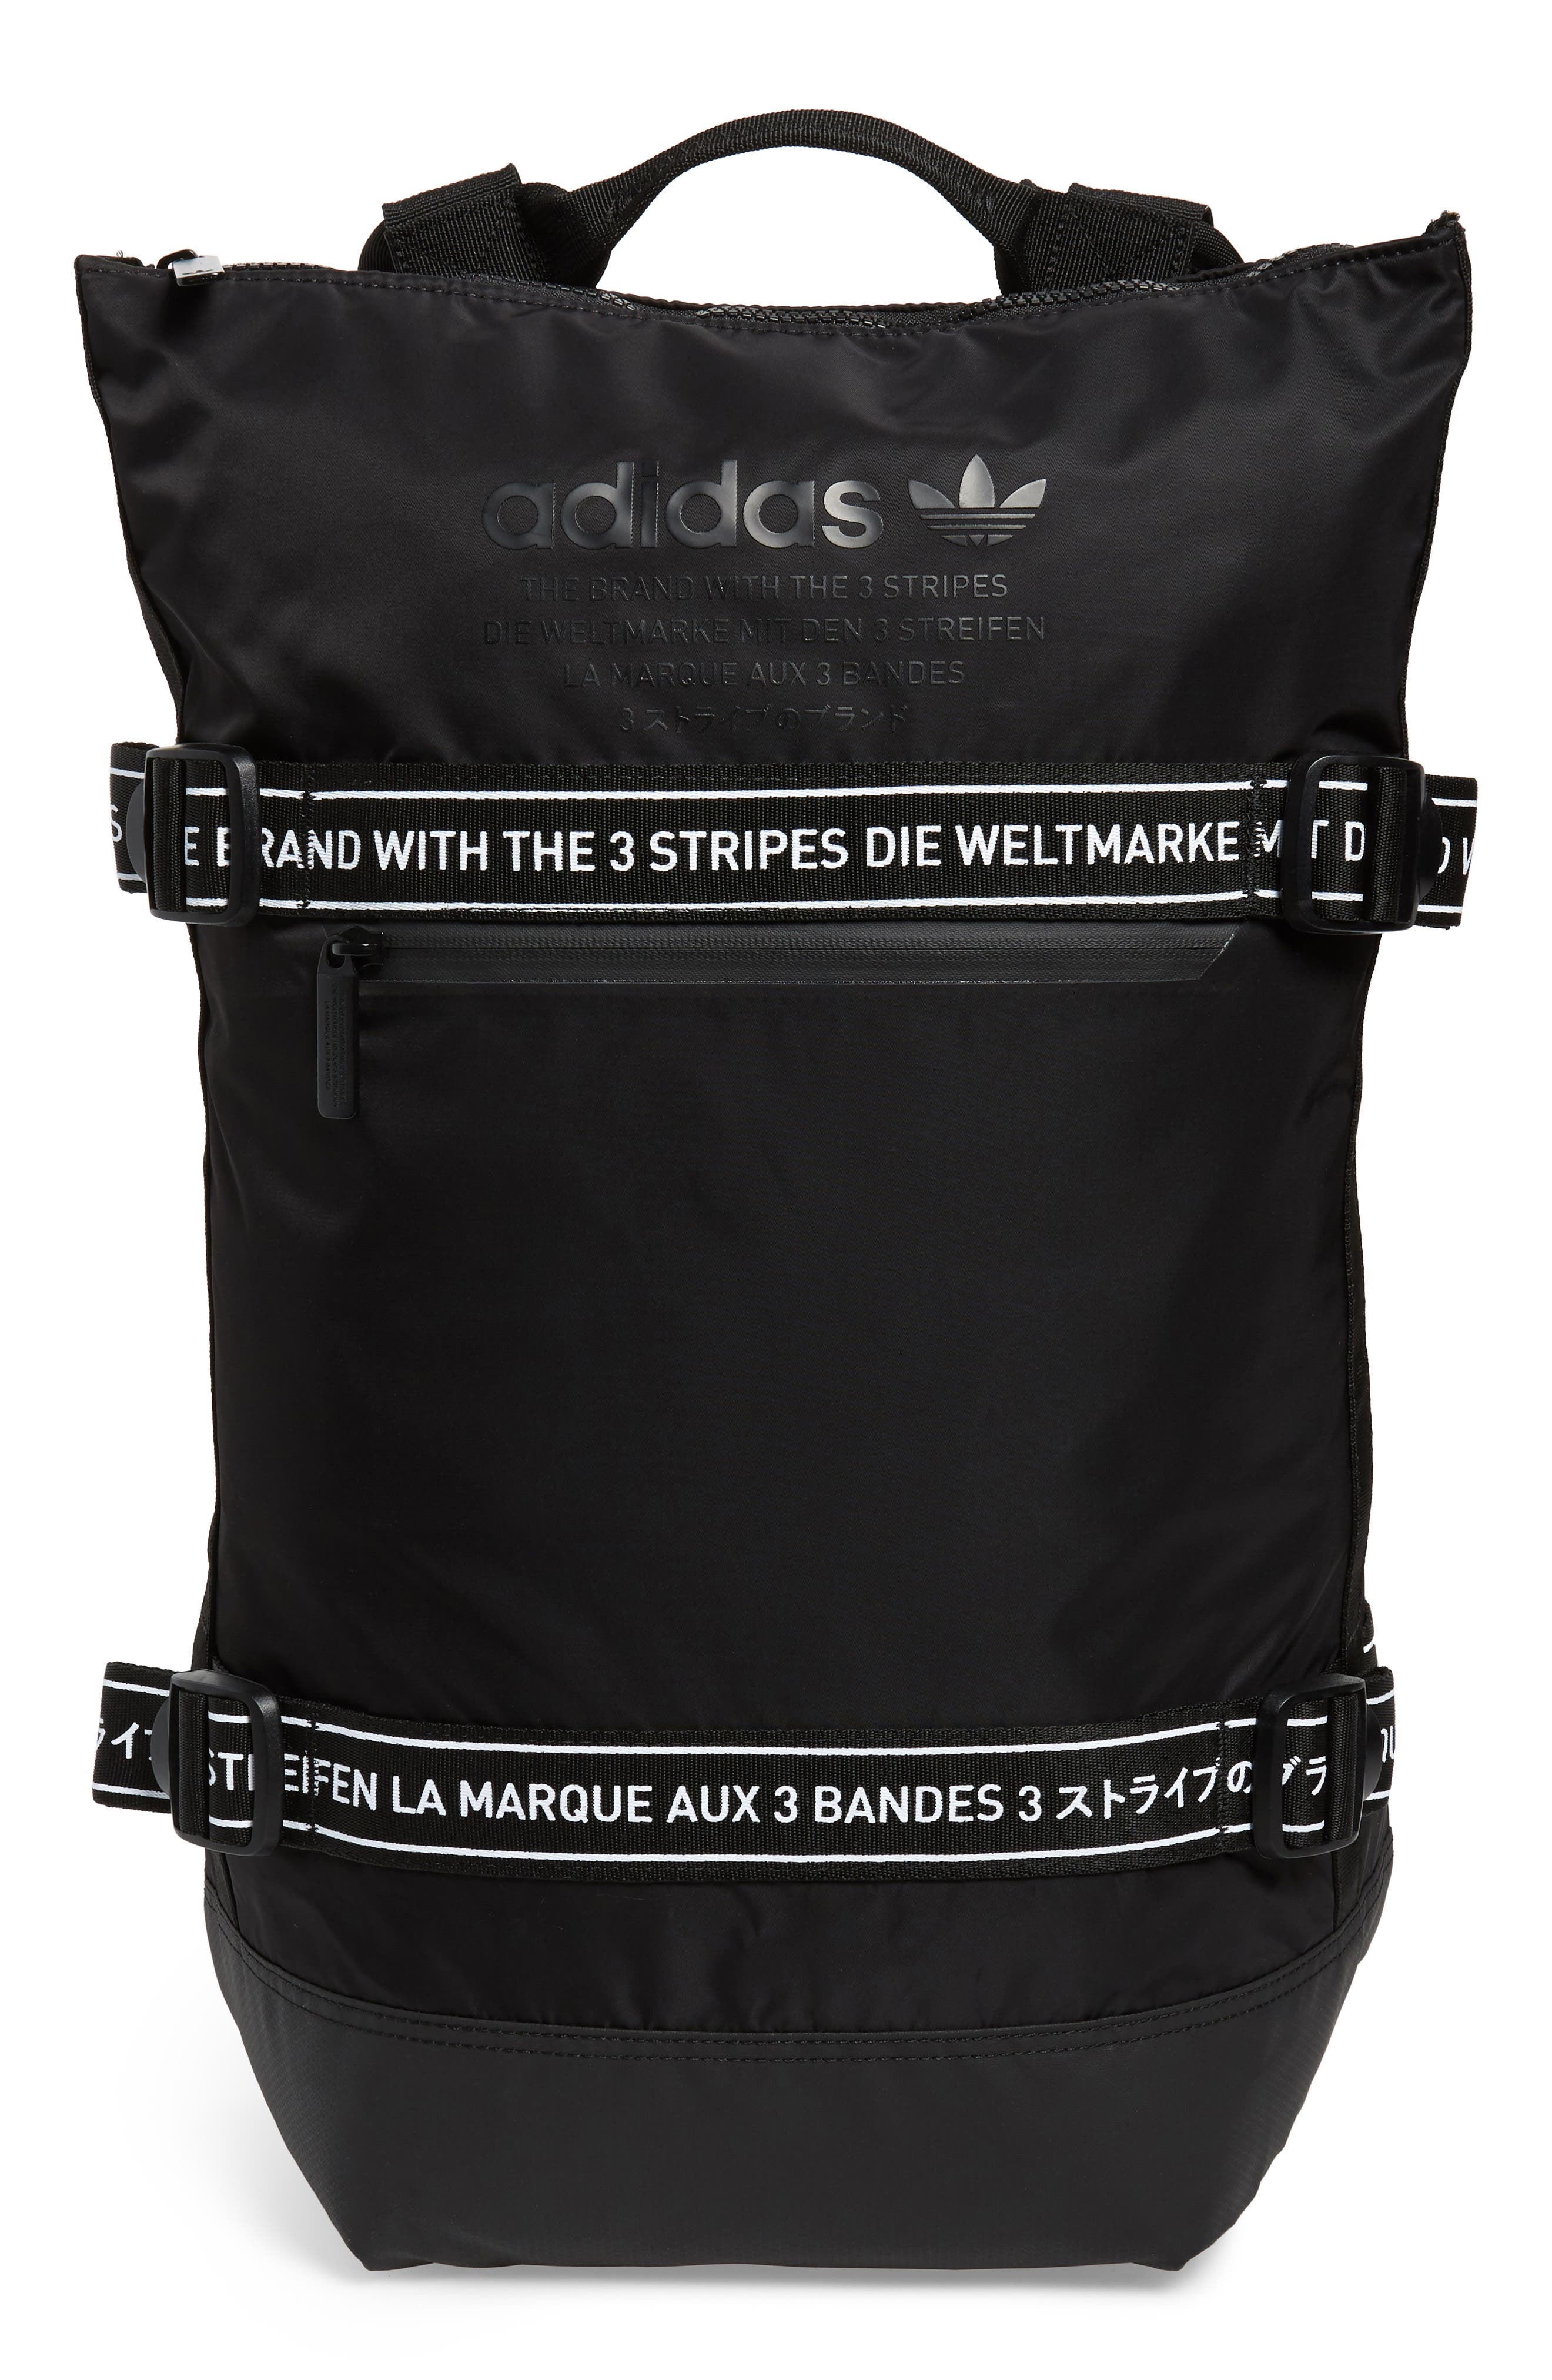 ADIDAS ORIGINALS adidas NMD Backpack, Main, color, 001